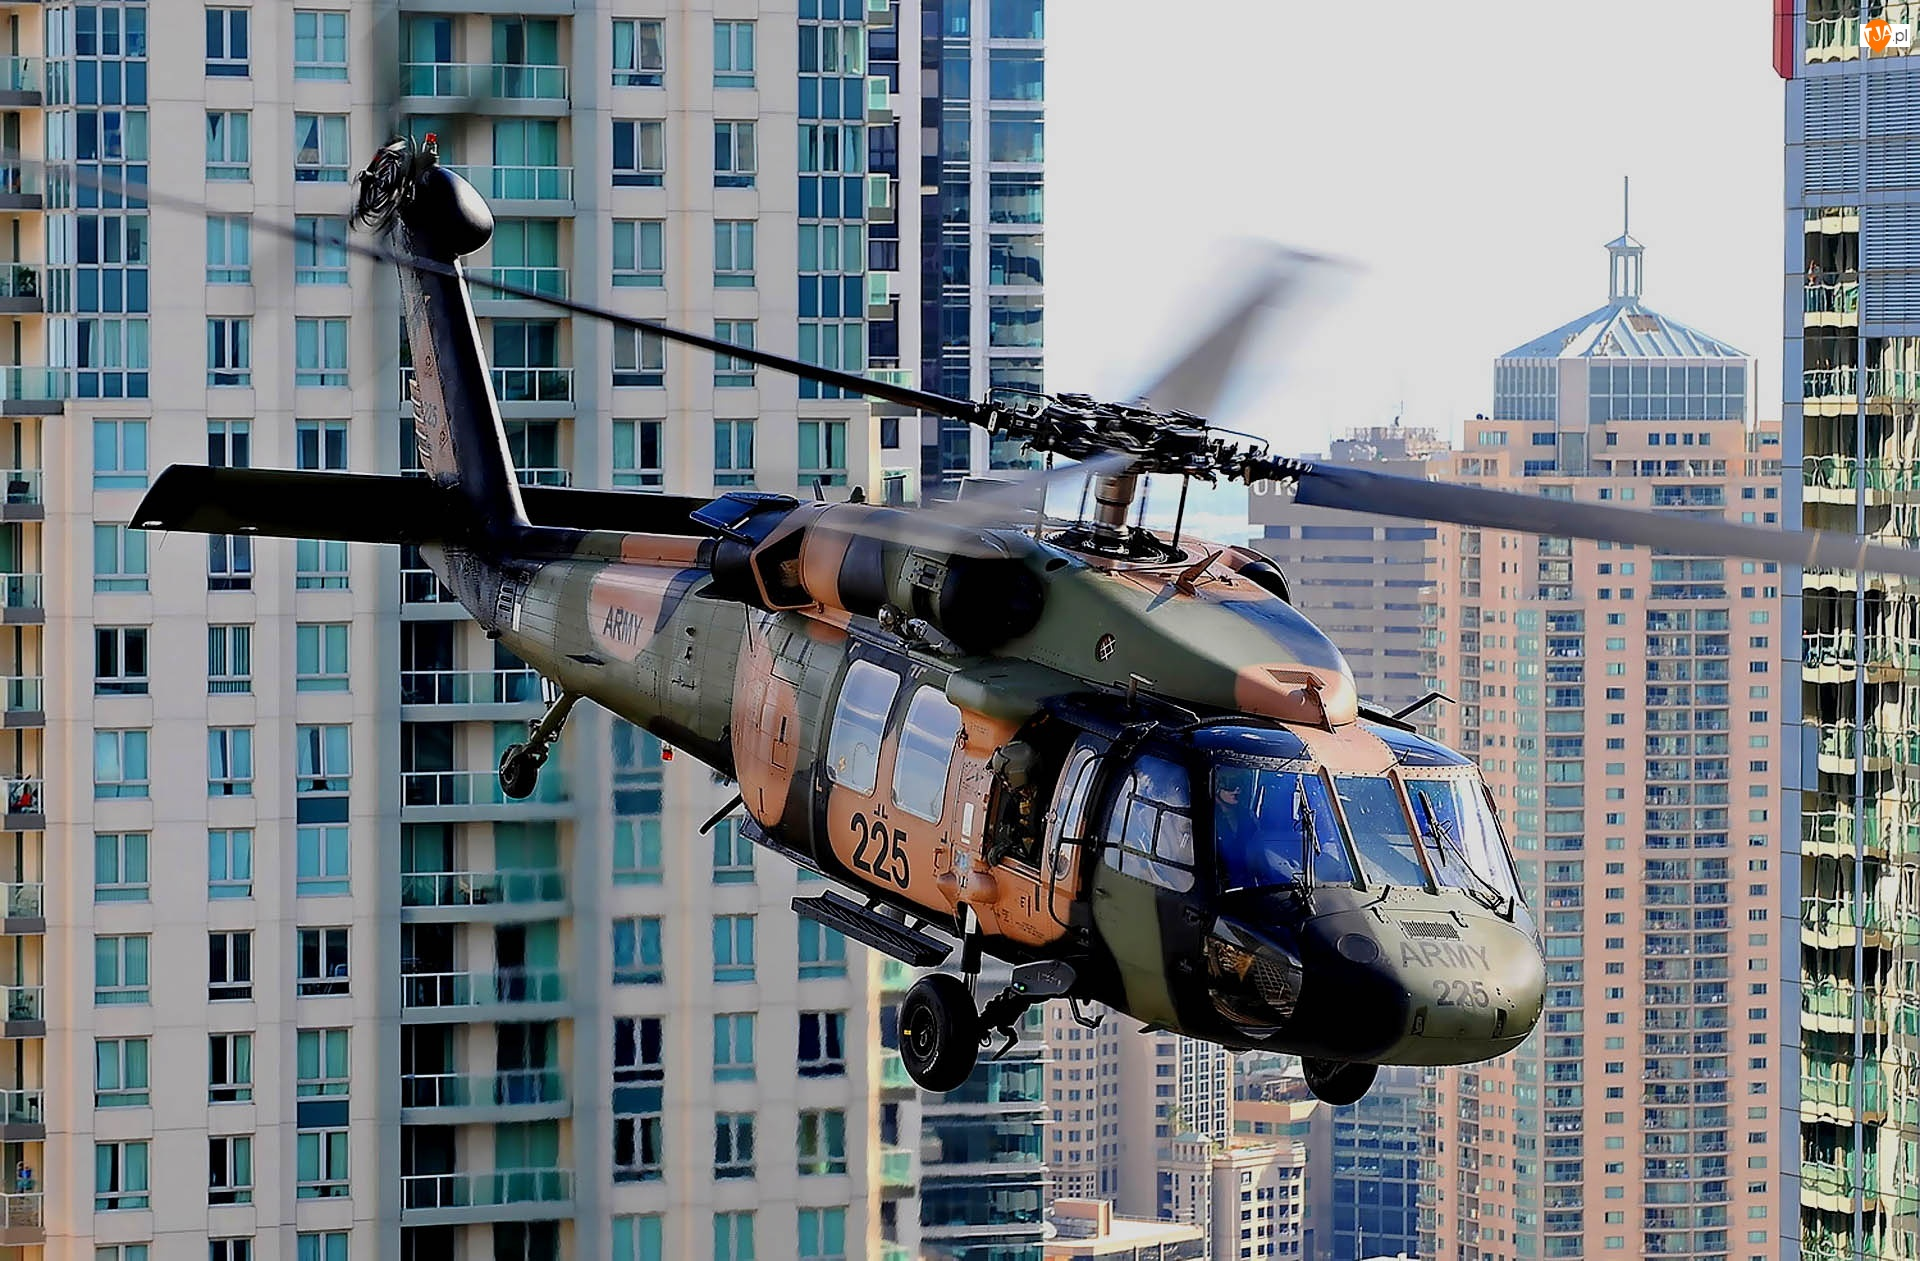 Sikorsky UH-60 Black Hawk, Miasto